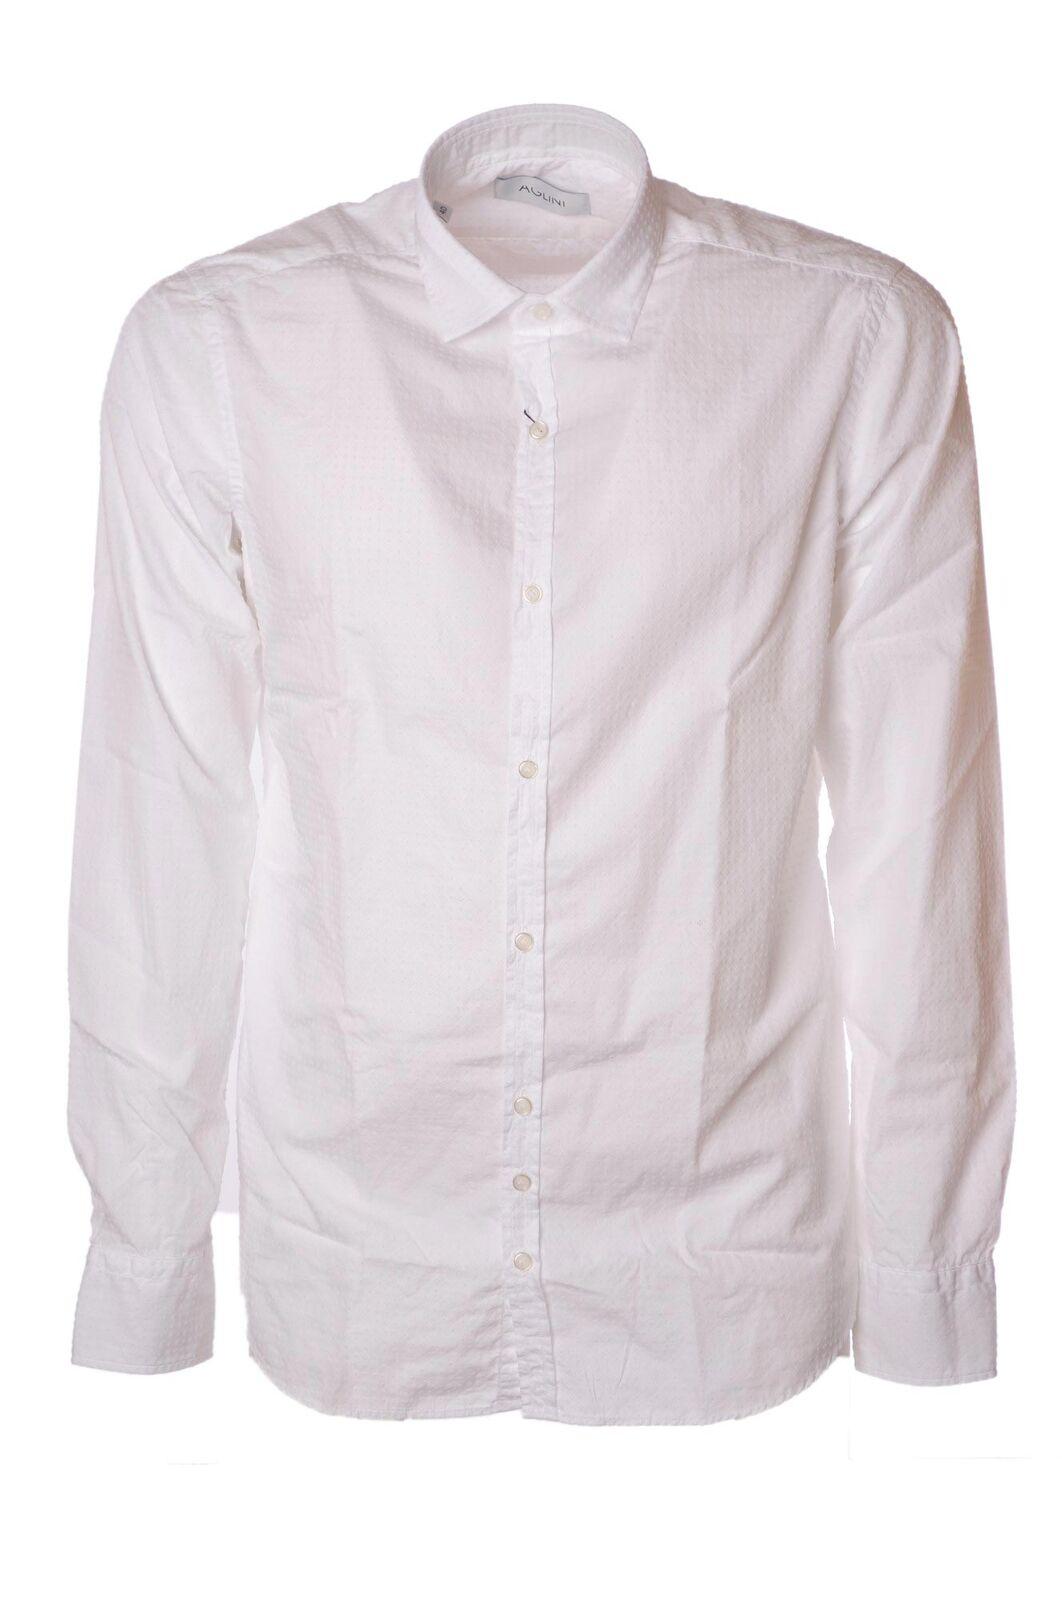 Aglini - Shirts-Shirt - Man - White - 4331410C184135